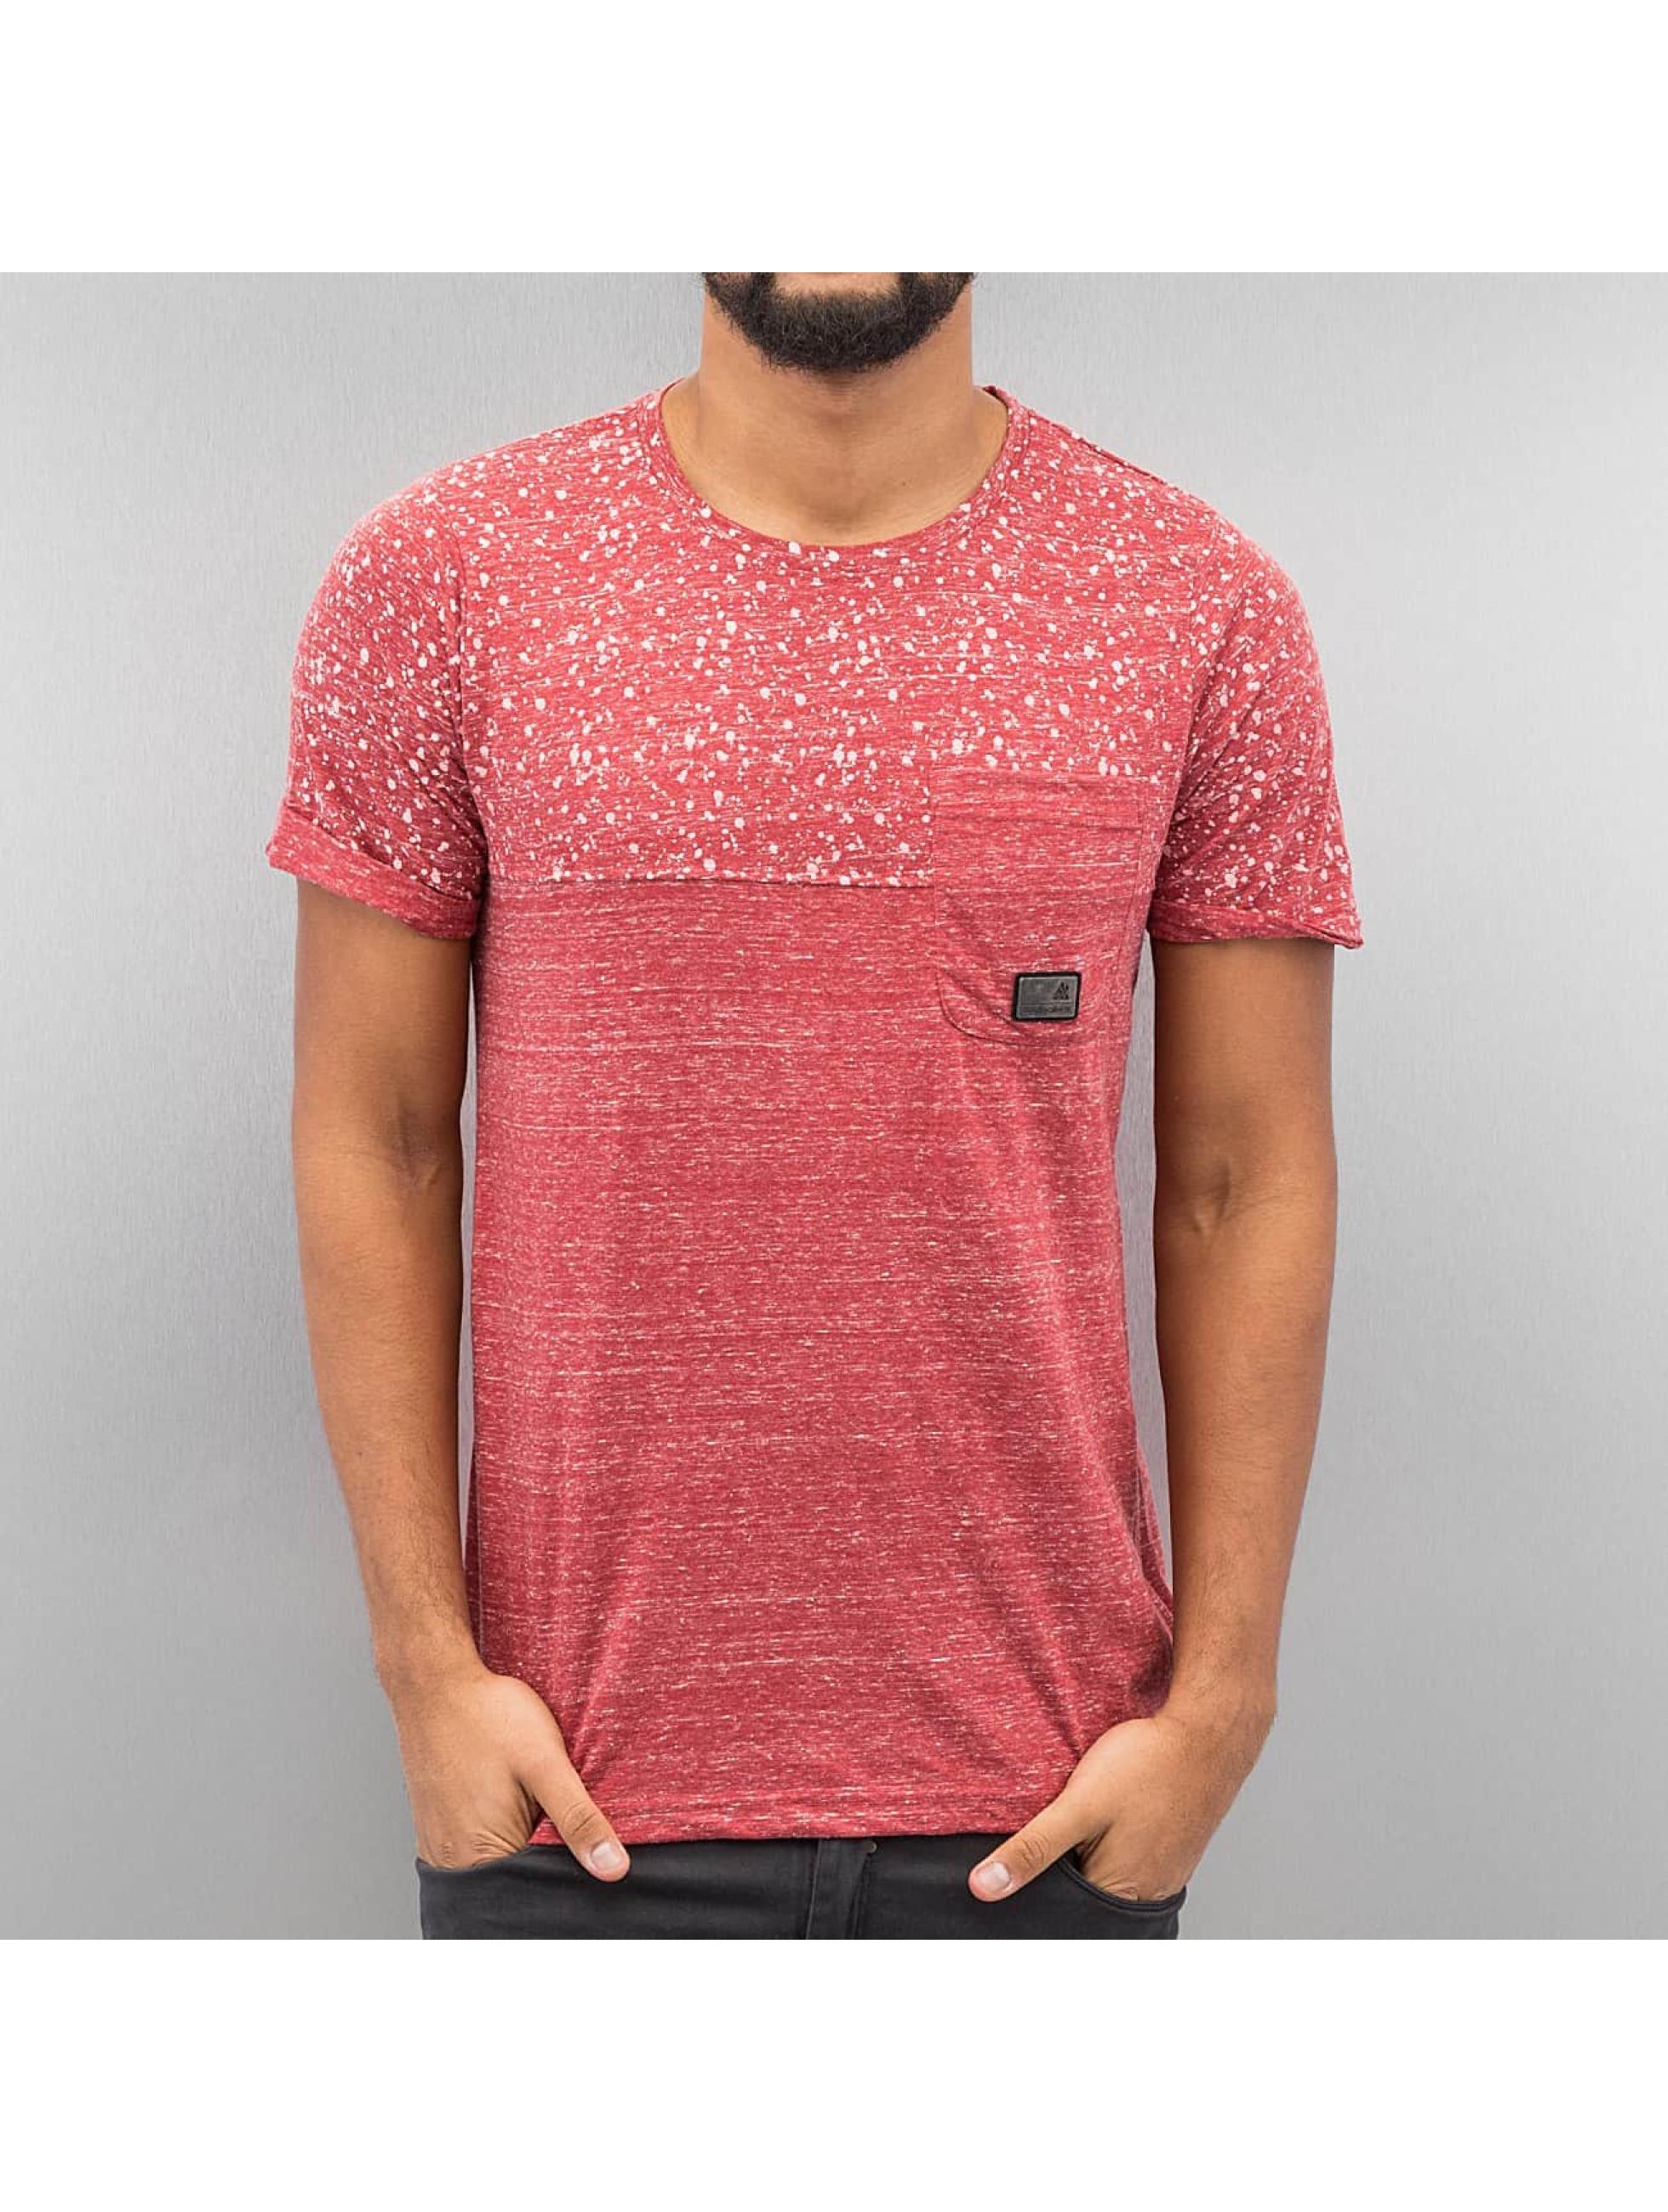 Alife & Kickin T-shirt Vin rosso